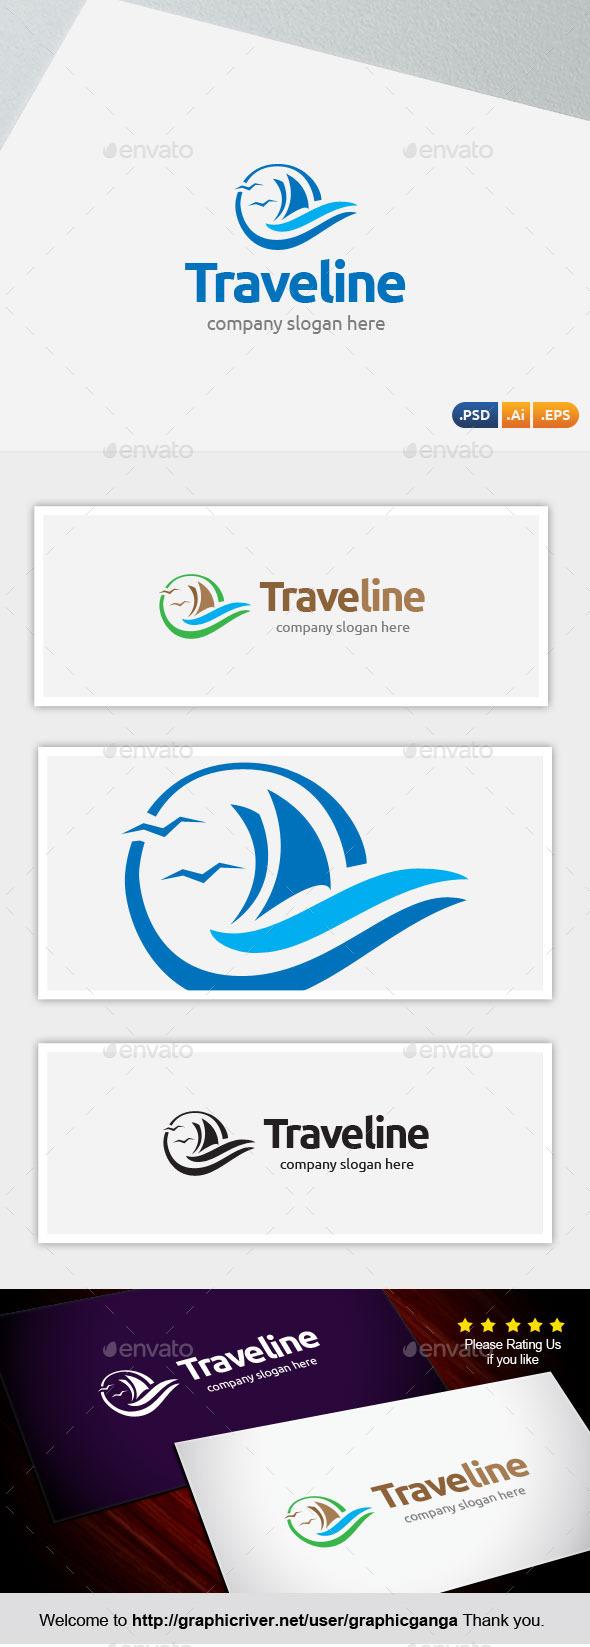 GraphicRiver Traveline 10874099